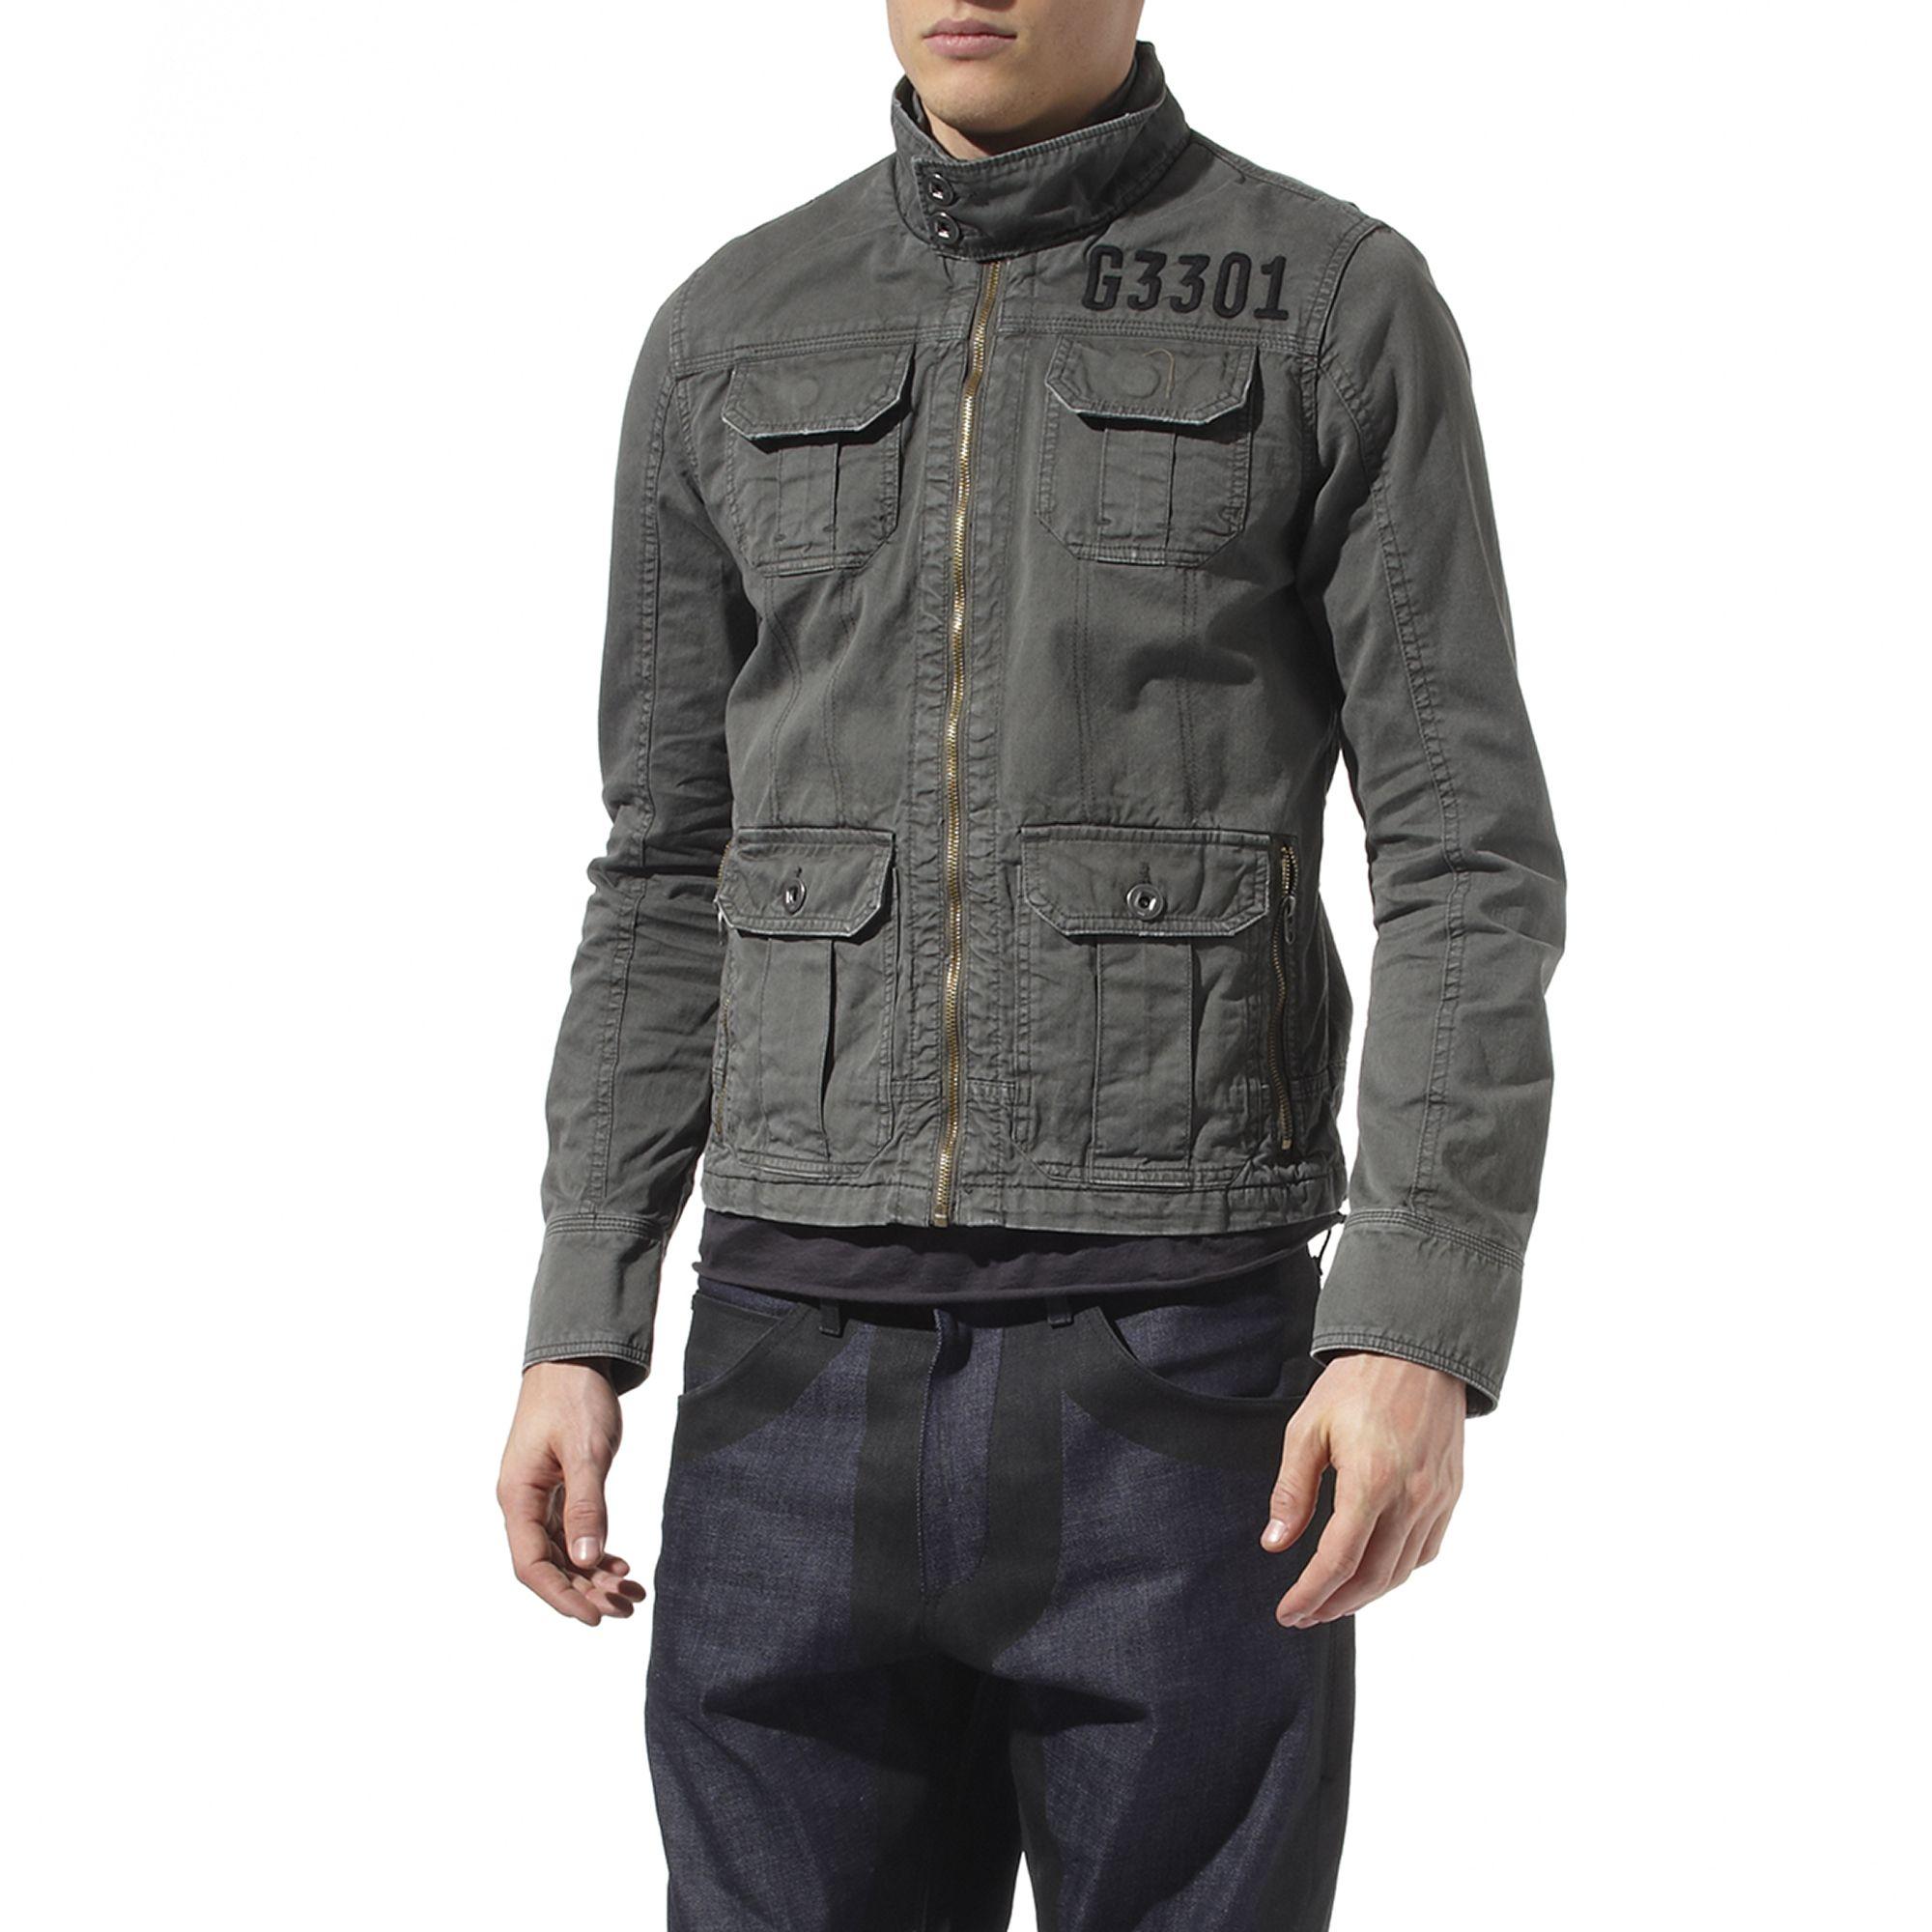 lyst g star raw dryden jacket in gray for men. Black Bedroom Furniture Sets. Home Design Ideas